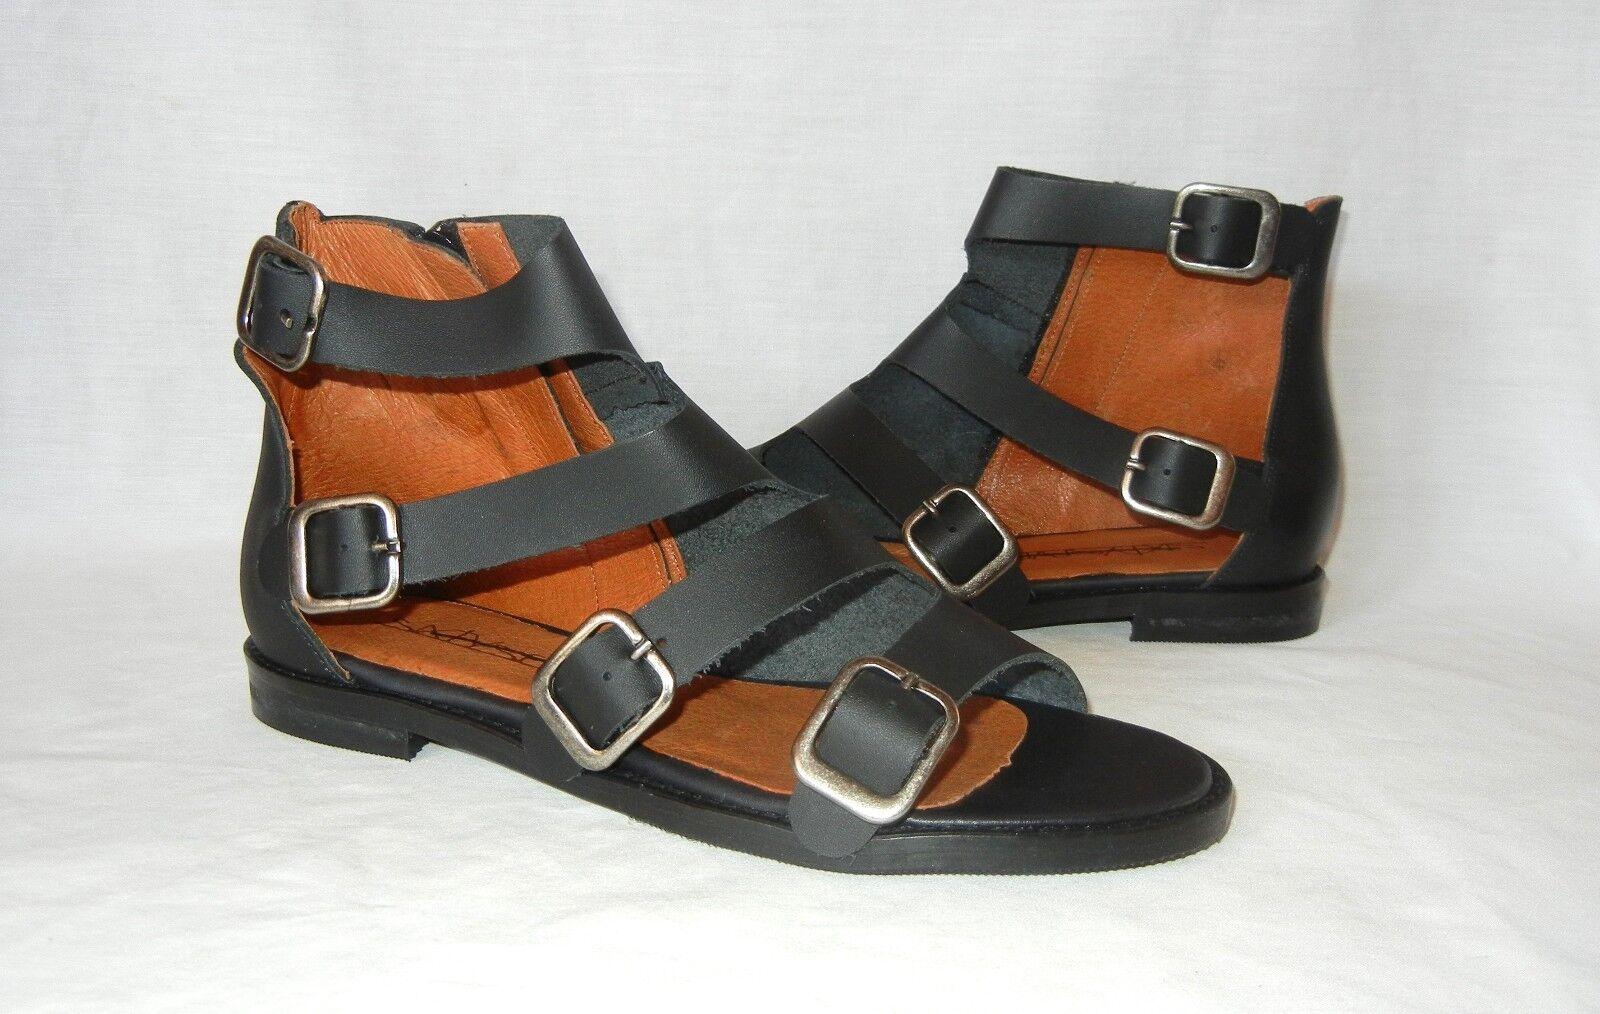 Sixtyseven Damenschuhe Lorik Asymmetrical Leder Ankle Boot Sandales Retail 155 sz 8